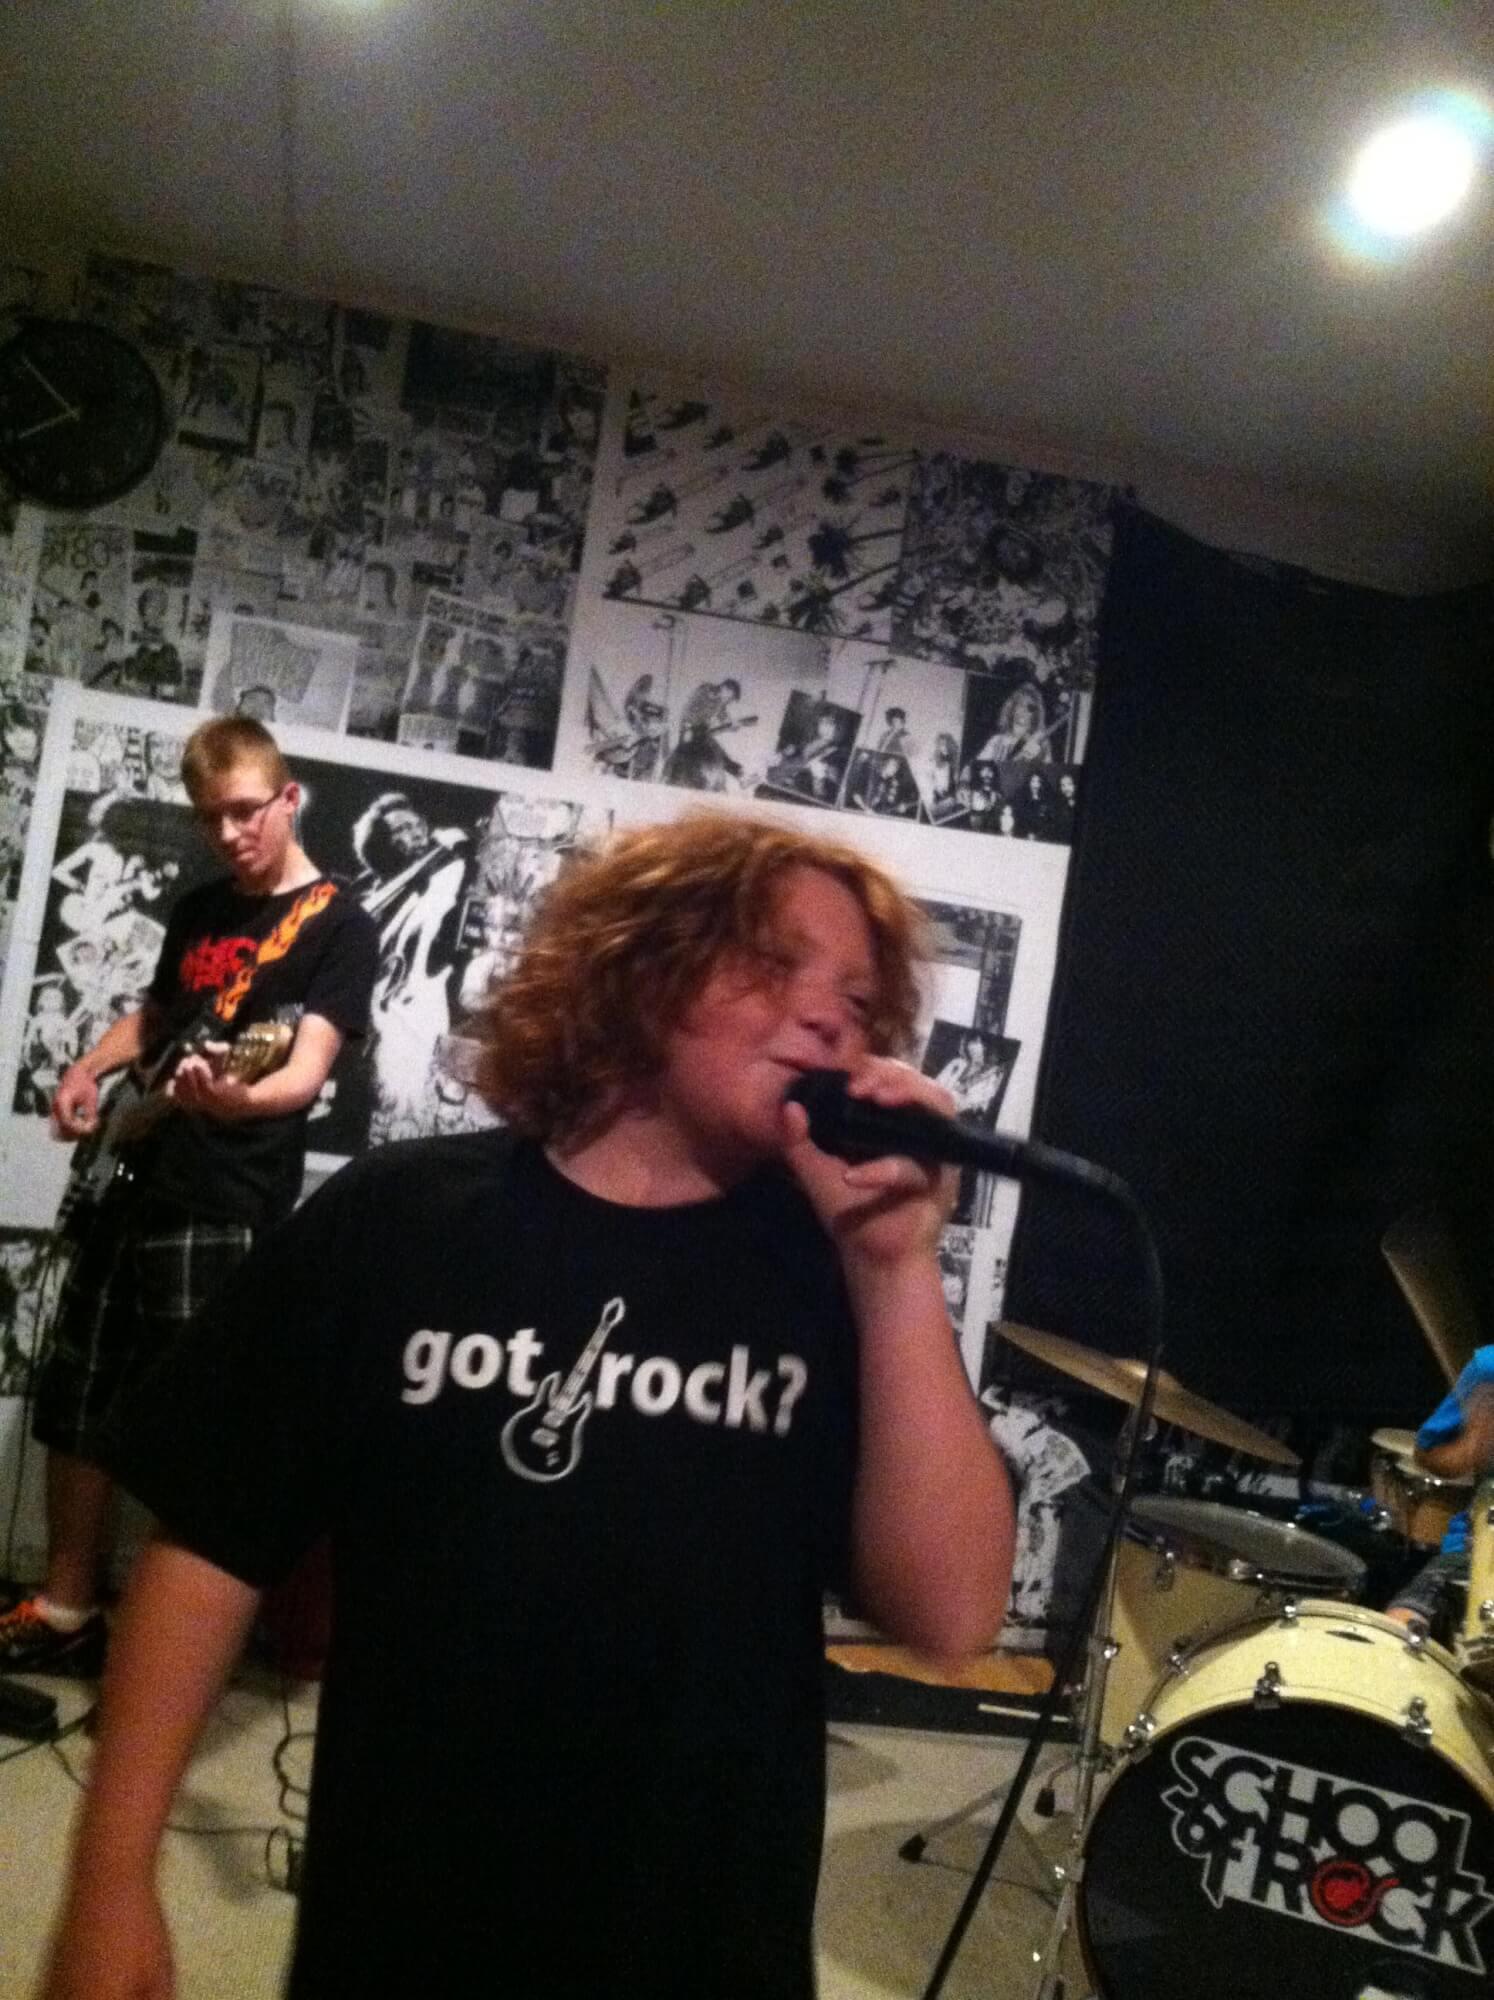 School of Rock Doylestown is the best music school in Bucks County for kids and adults alike.